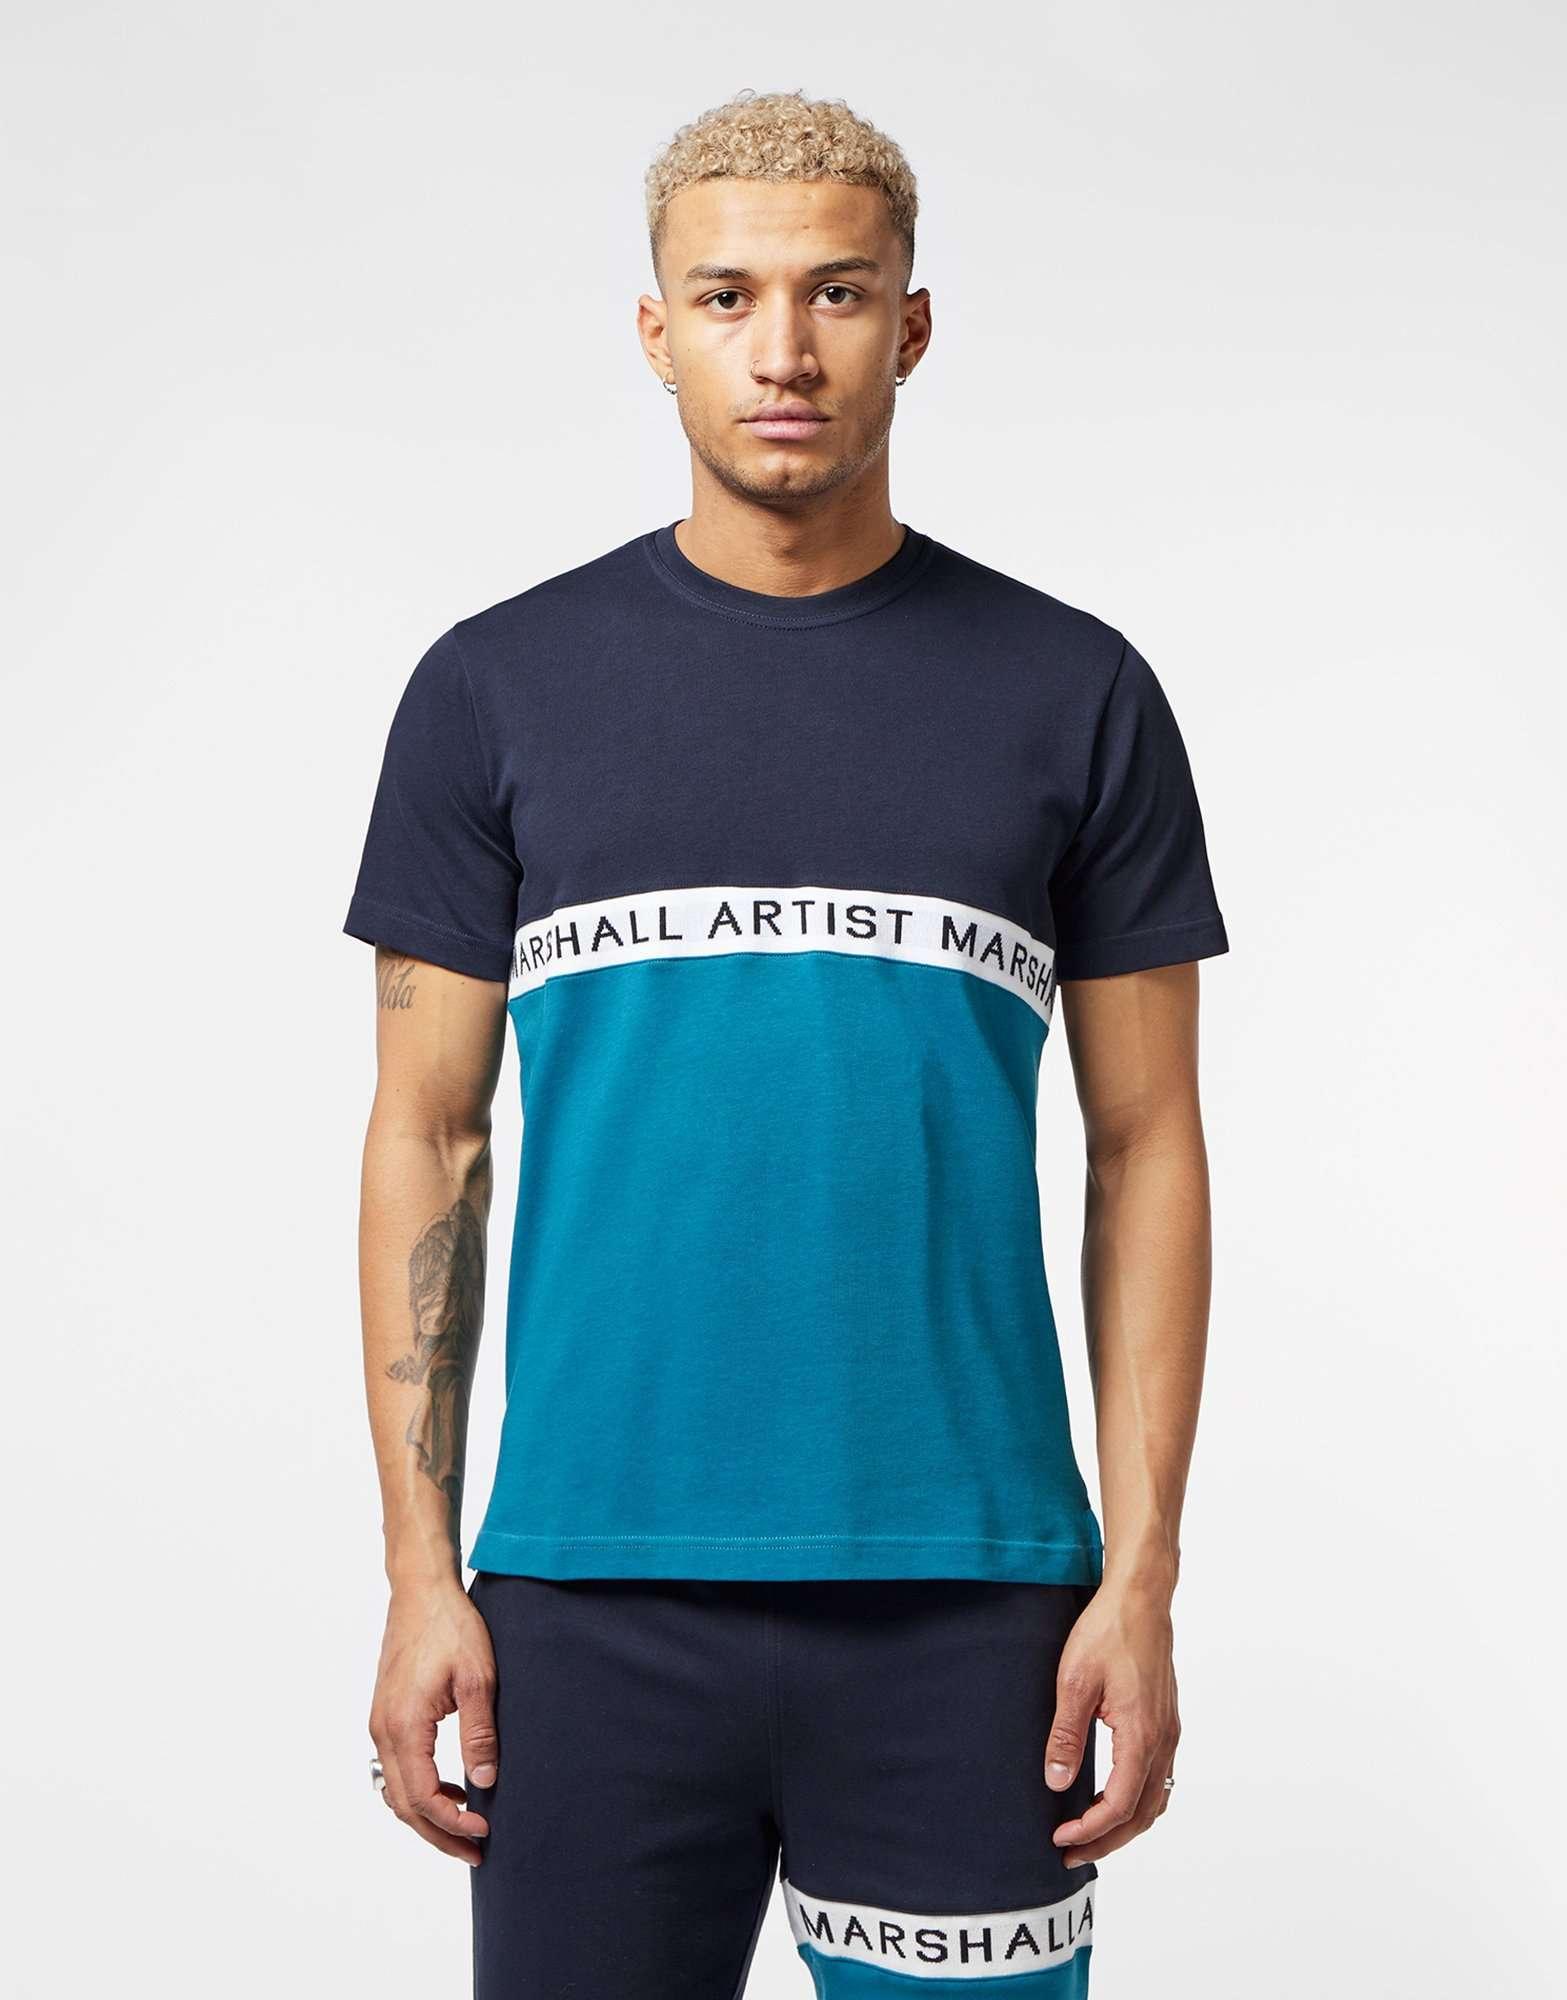 Marshall Artist Maglia Short Sleeve T-Shirt